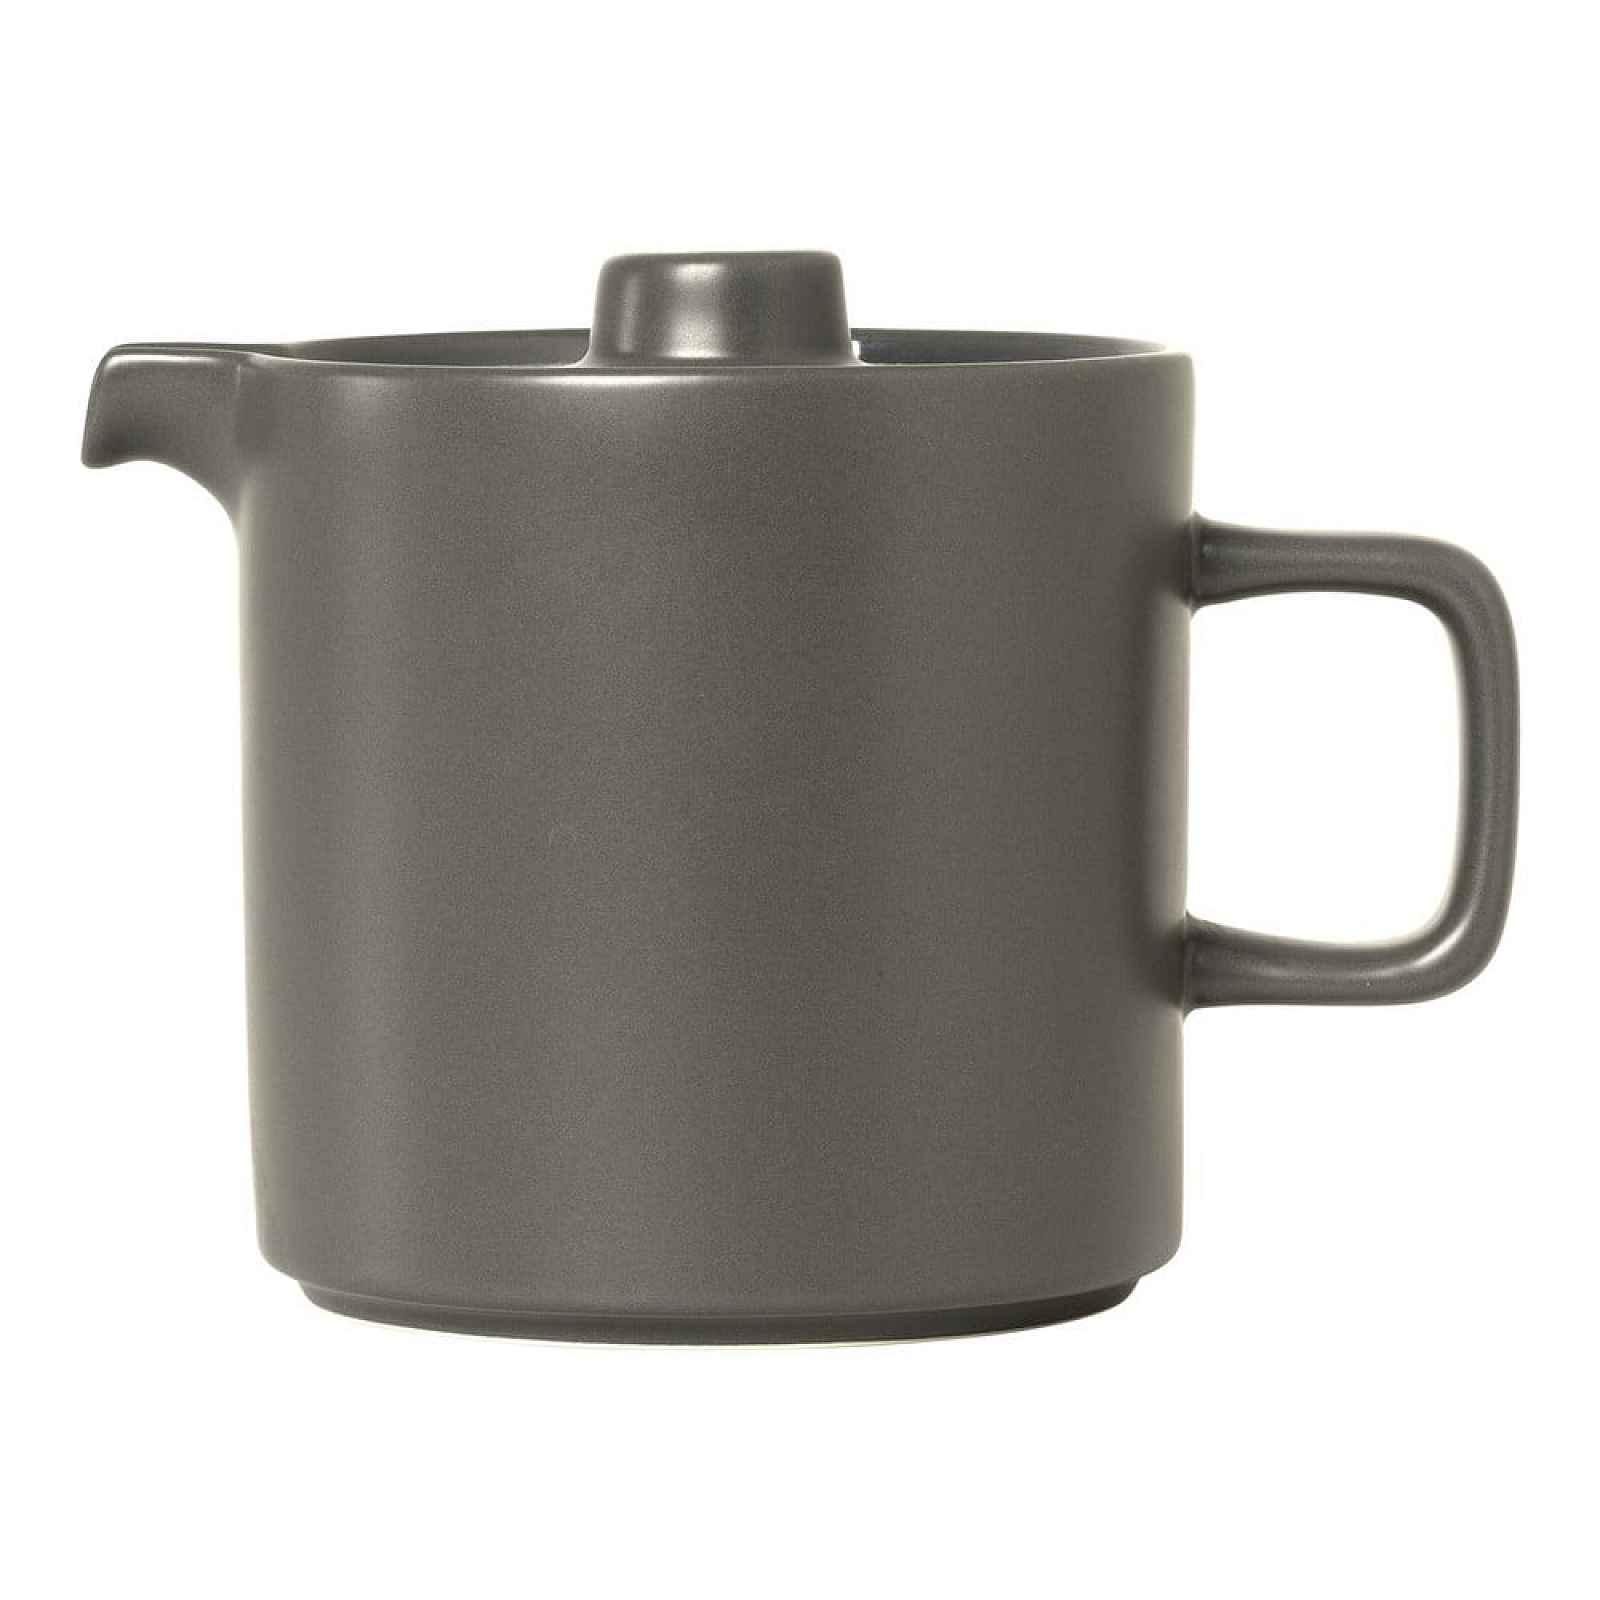 Šedá keramická čajová konvice Blomus Pilar,1l